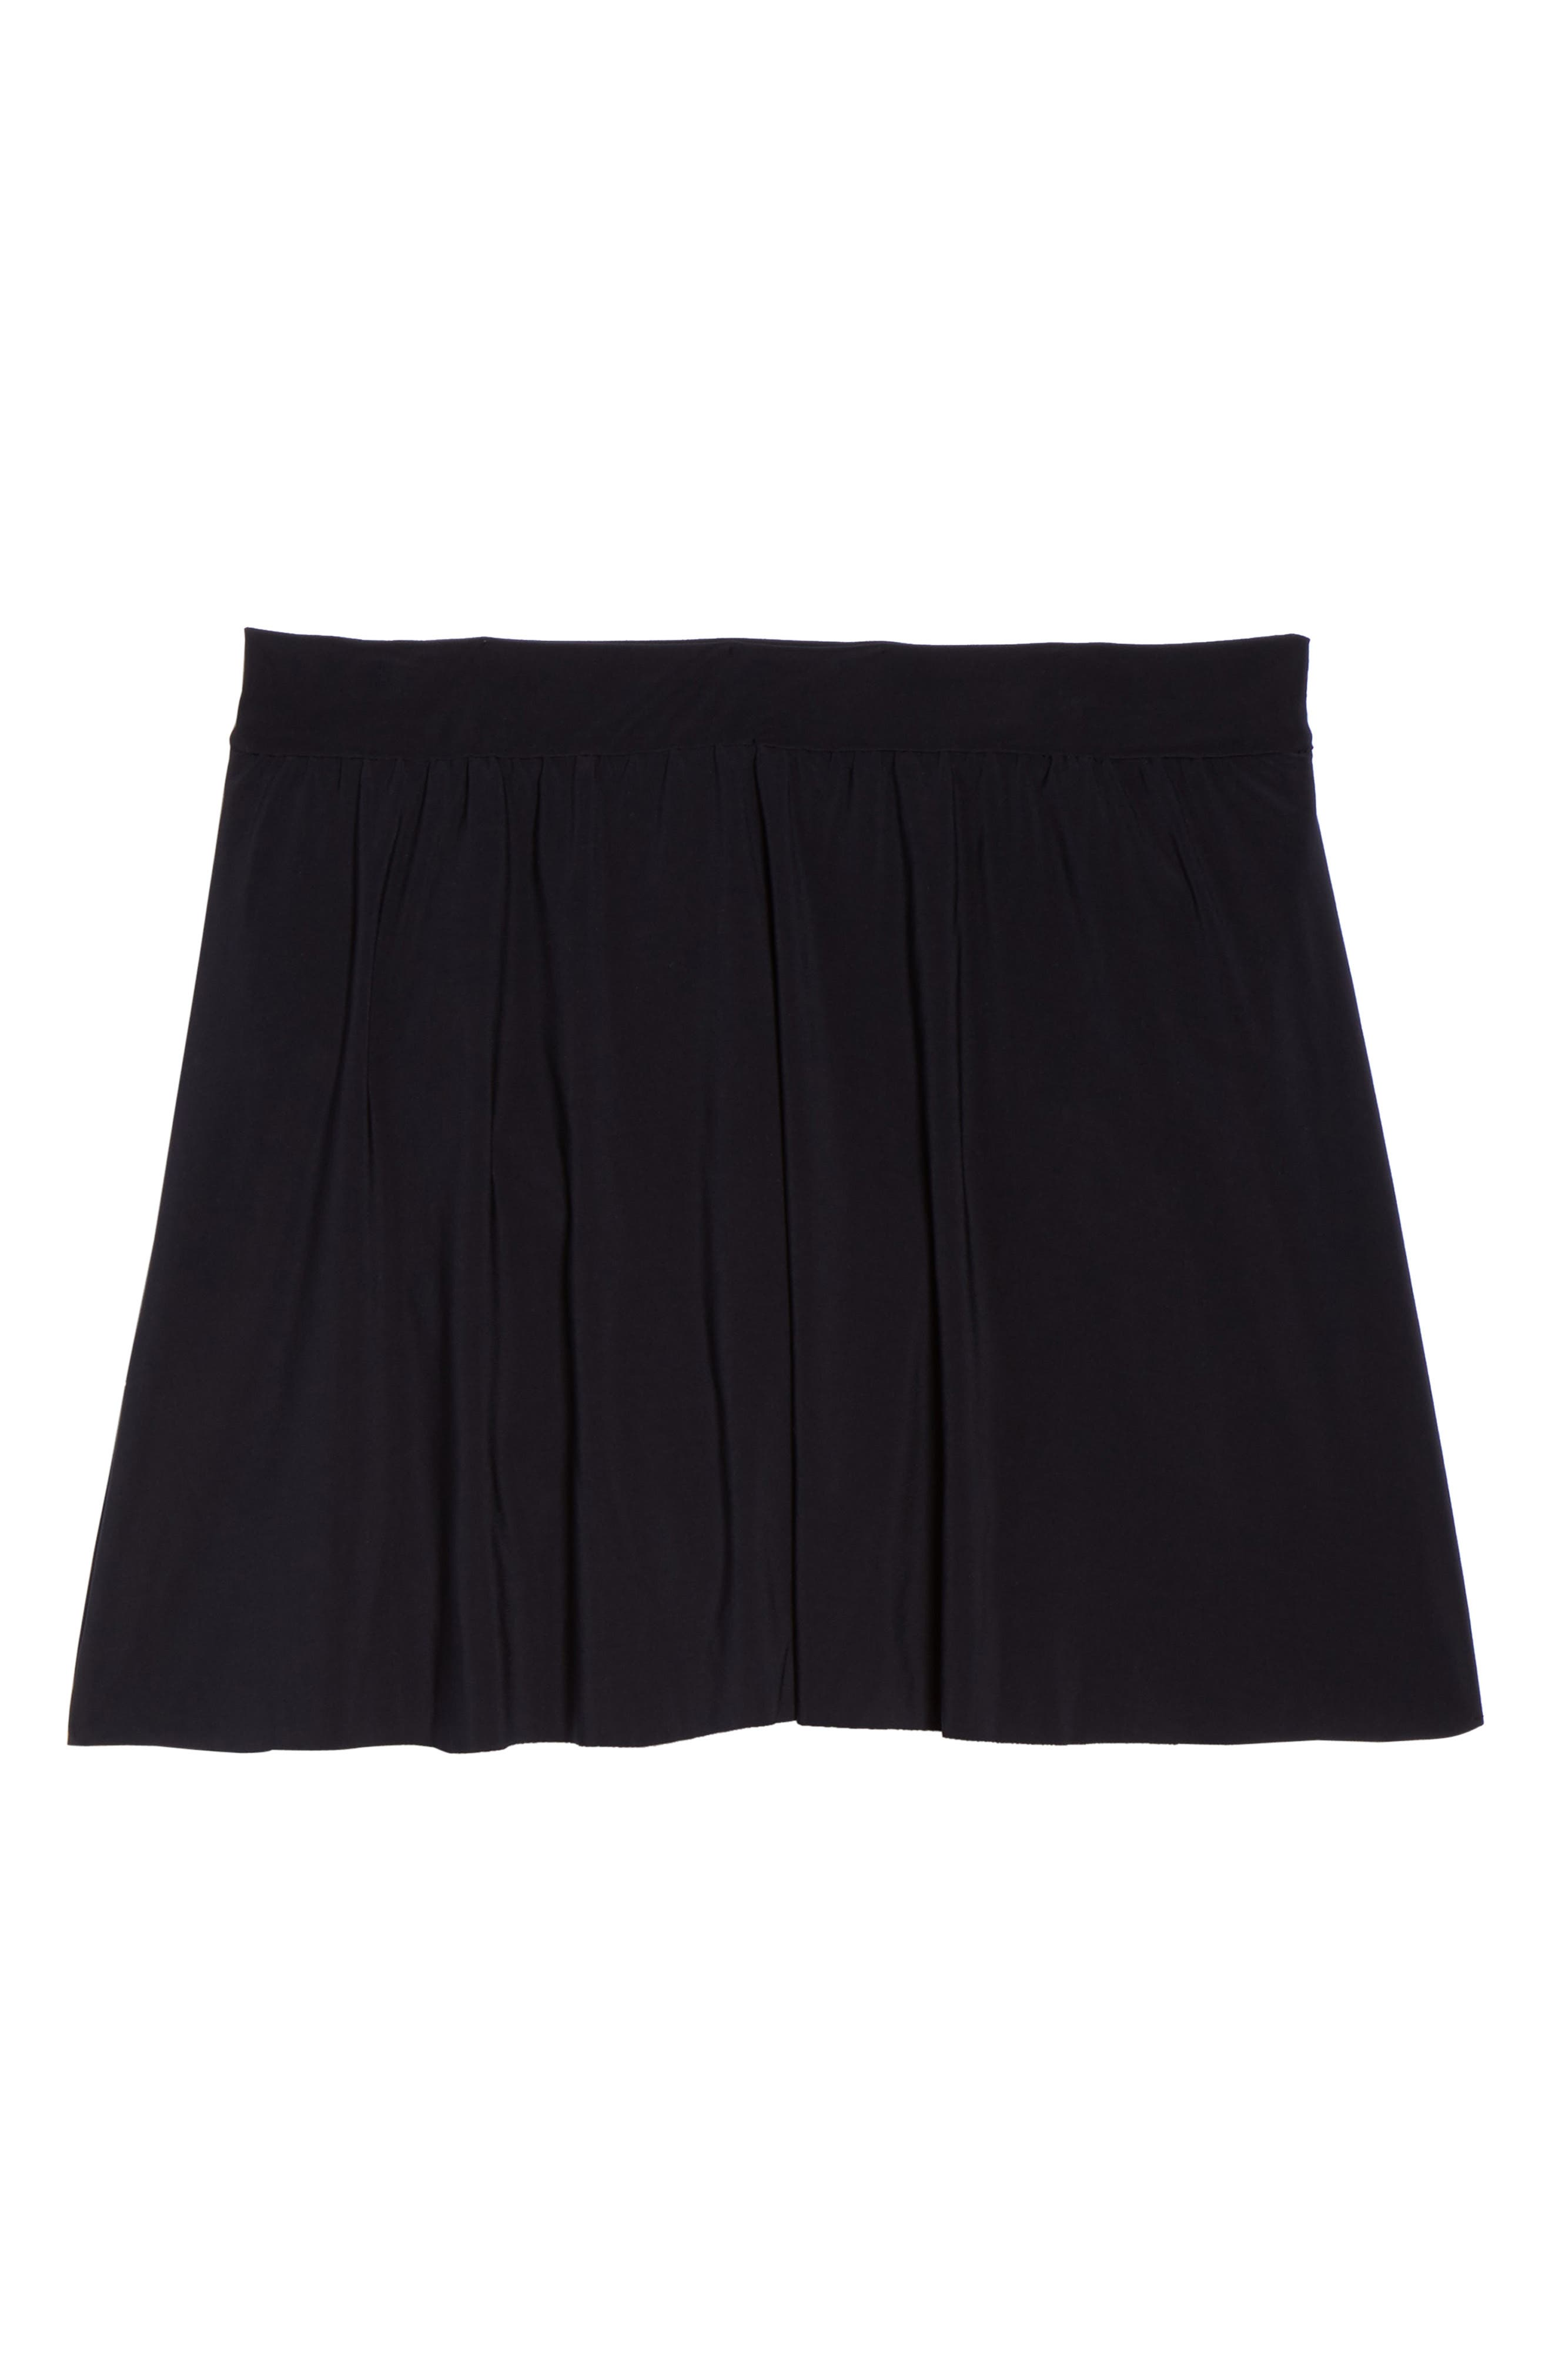 Skirted Bikini Bottoms,                             Alternate thumbnail 6, color,                             Black